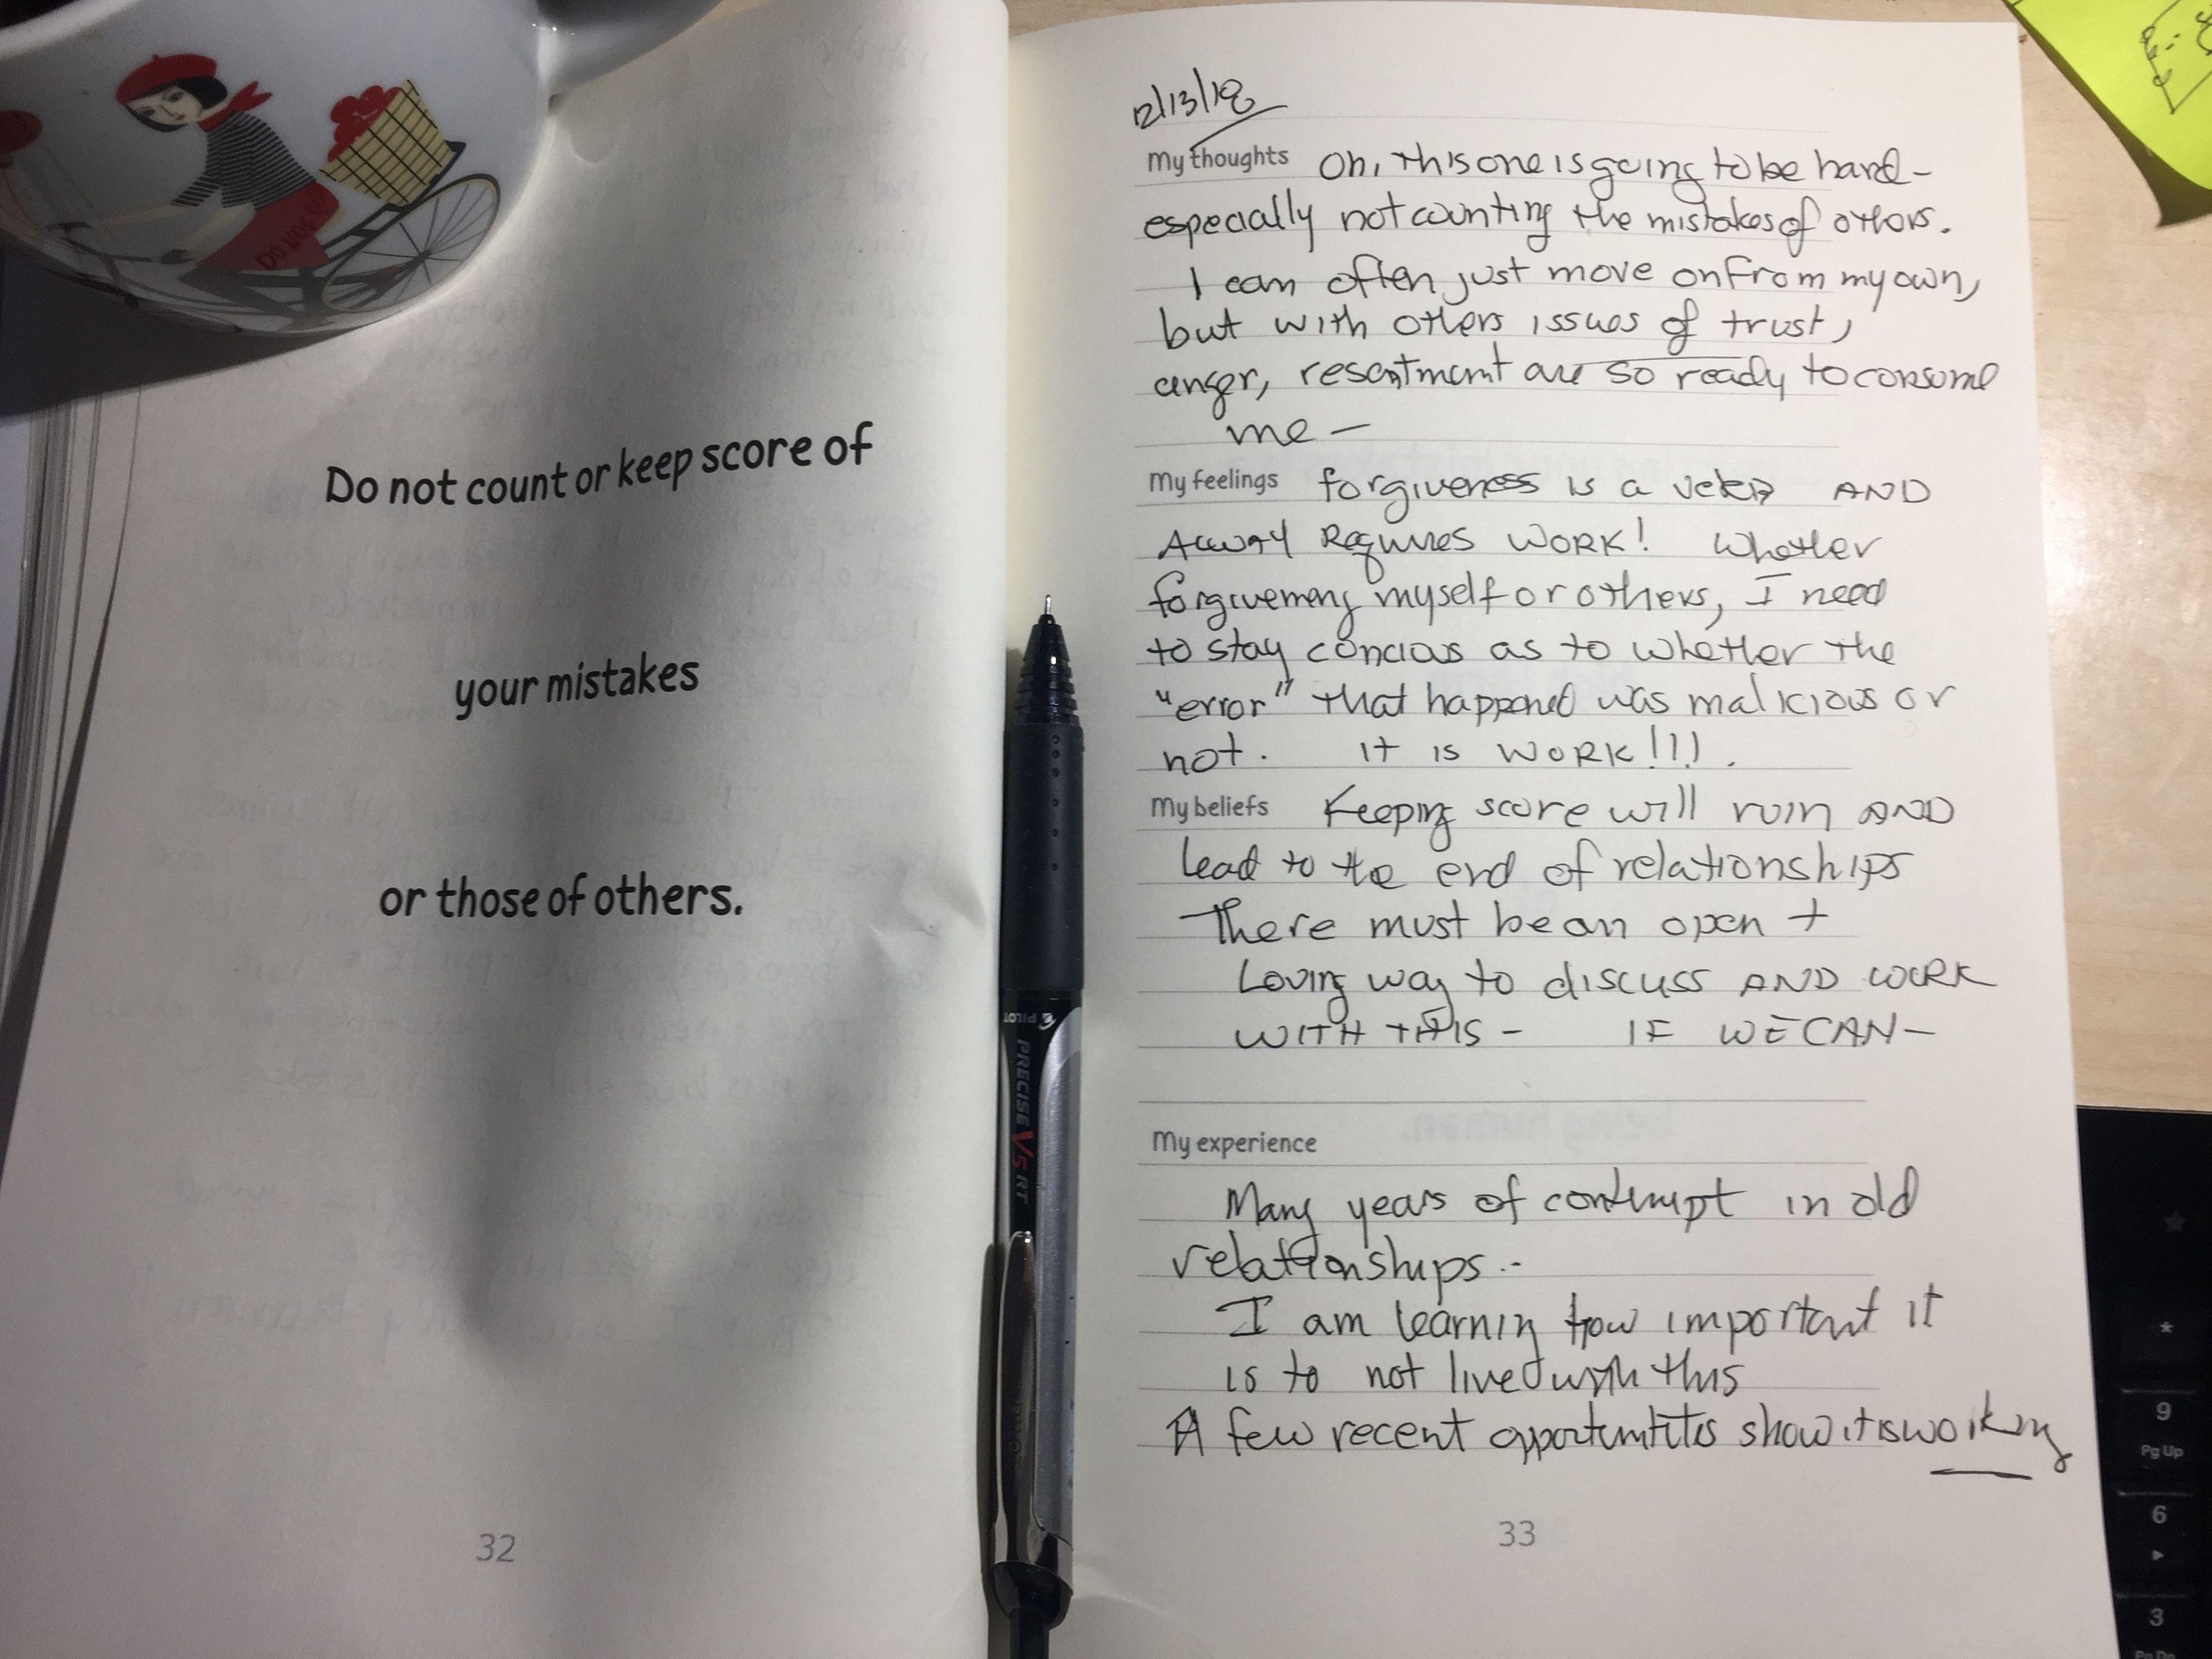 I Am Going Through Each Worksheet In Handbooks For Humans